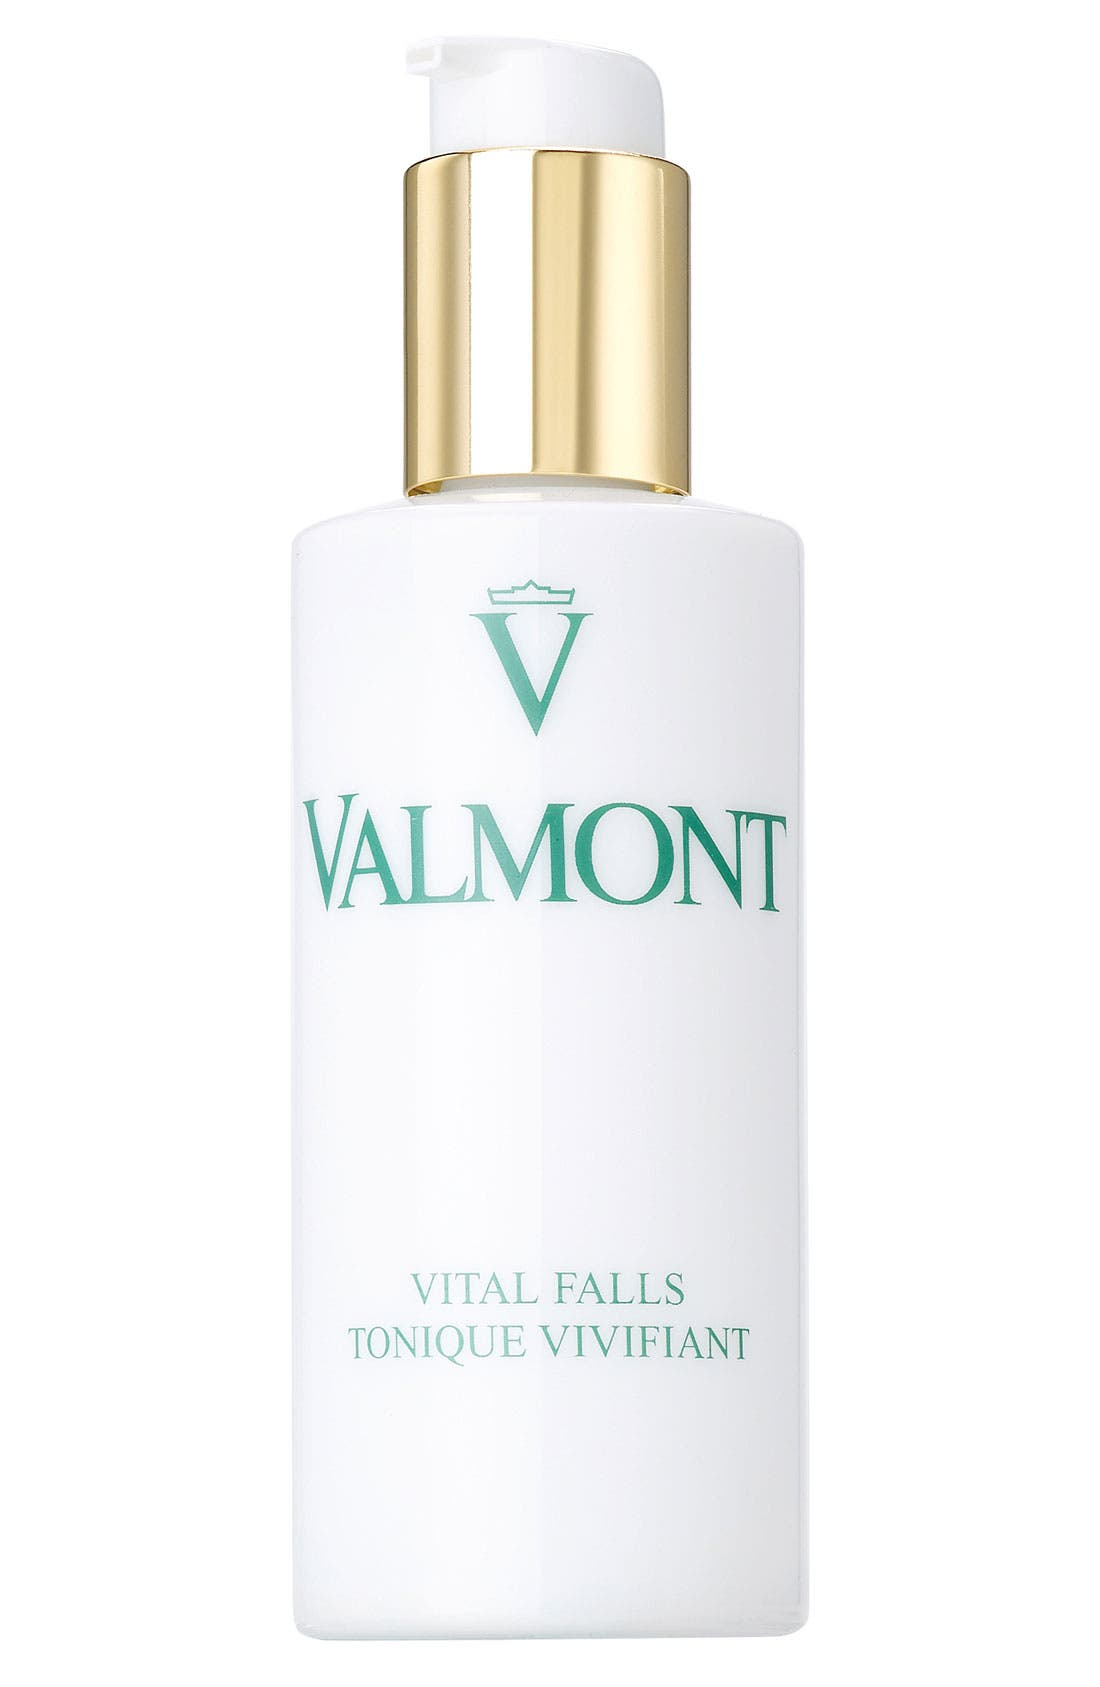 Valmont 'Vital Falls' Toner